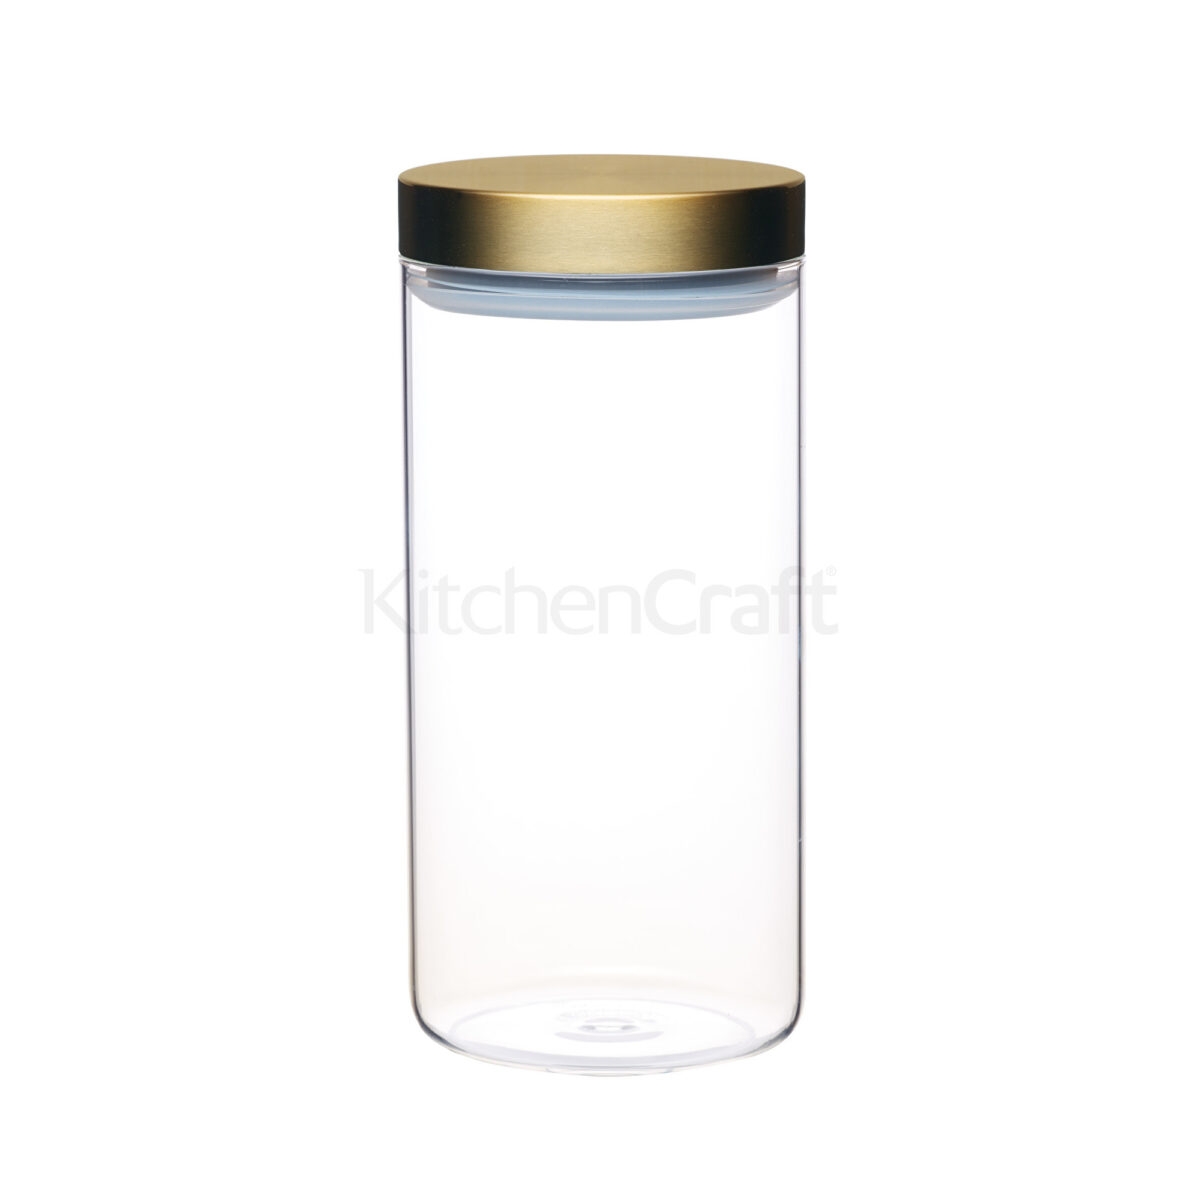 ae8dd224ef3 Click to enlarge. HomeBrandsMaster ClassMetallics Master Class Airtight  Large Glass Food Storage ...